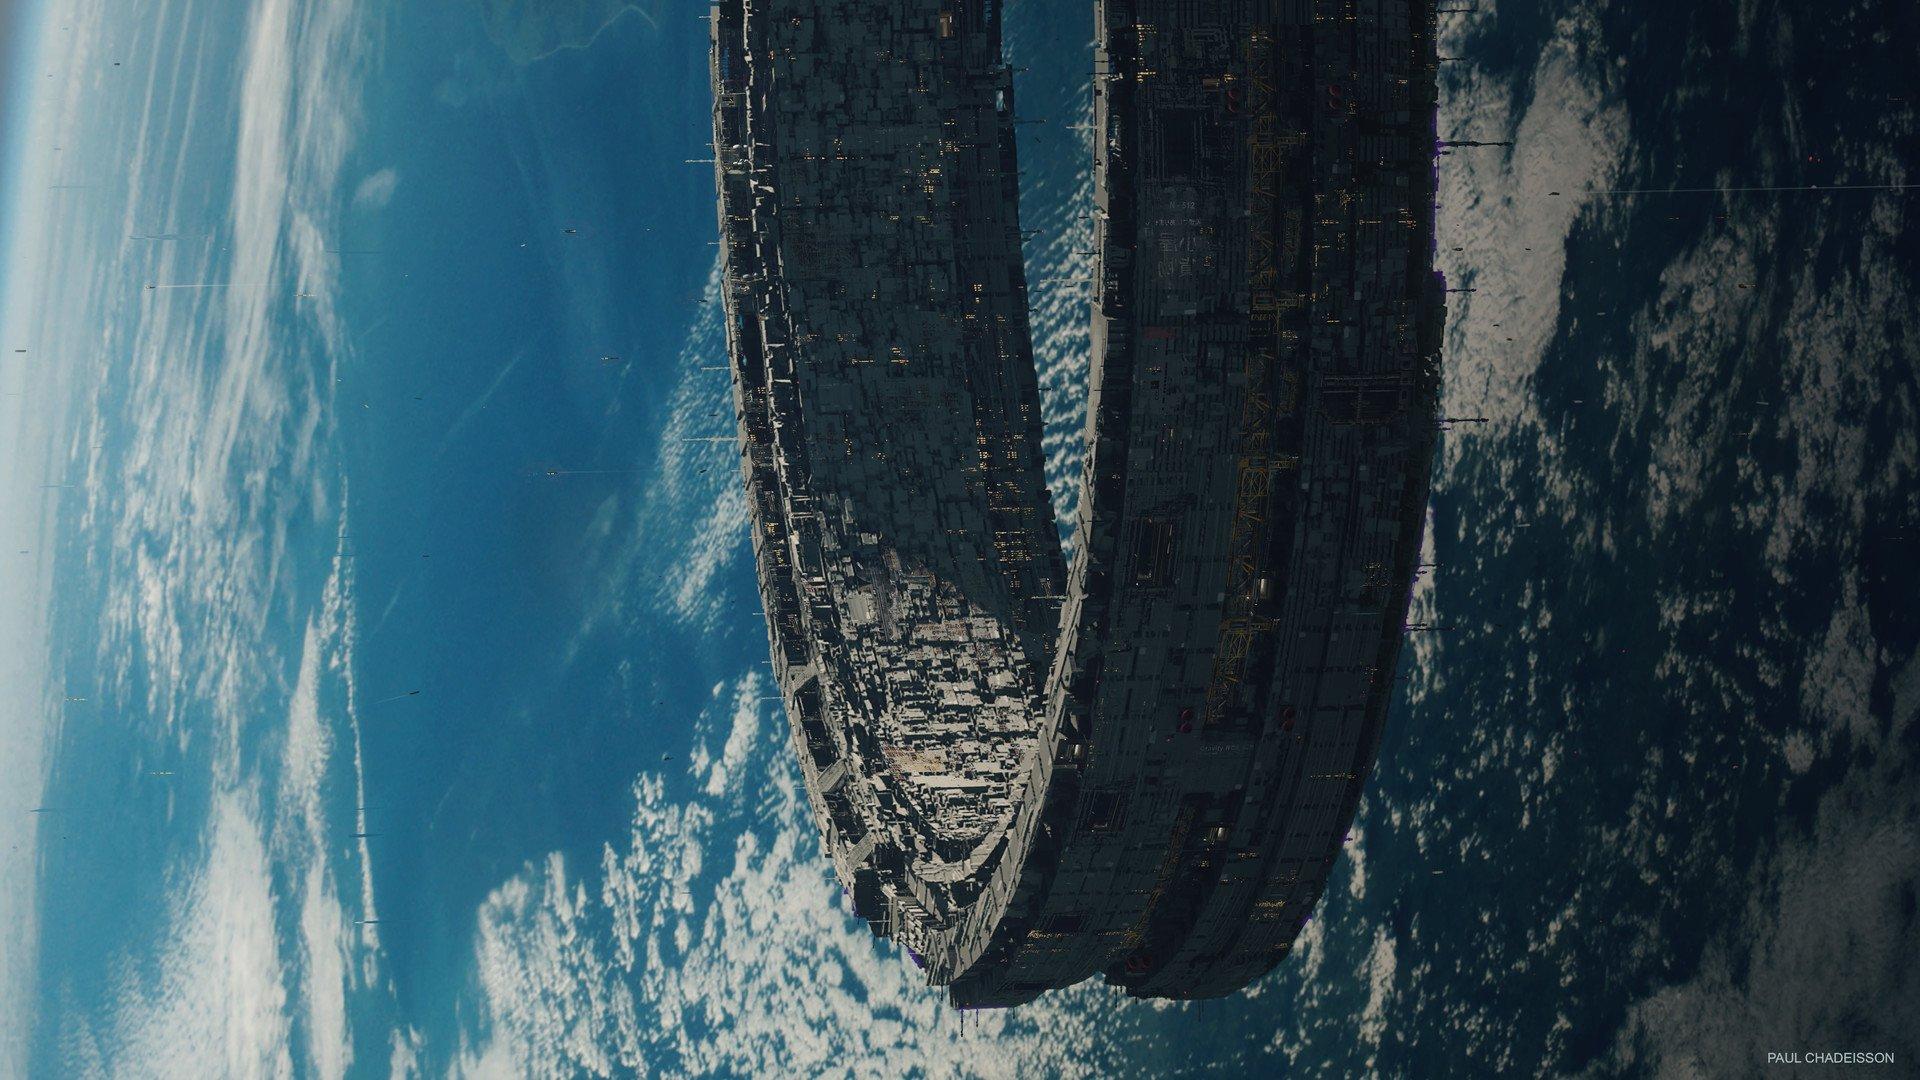 wallhaven-96m3m1.jpg